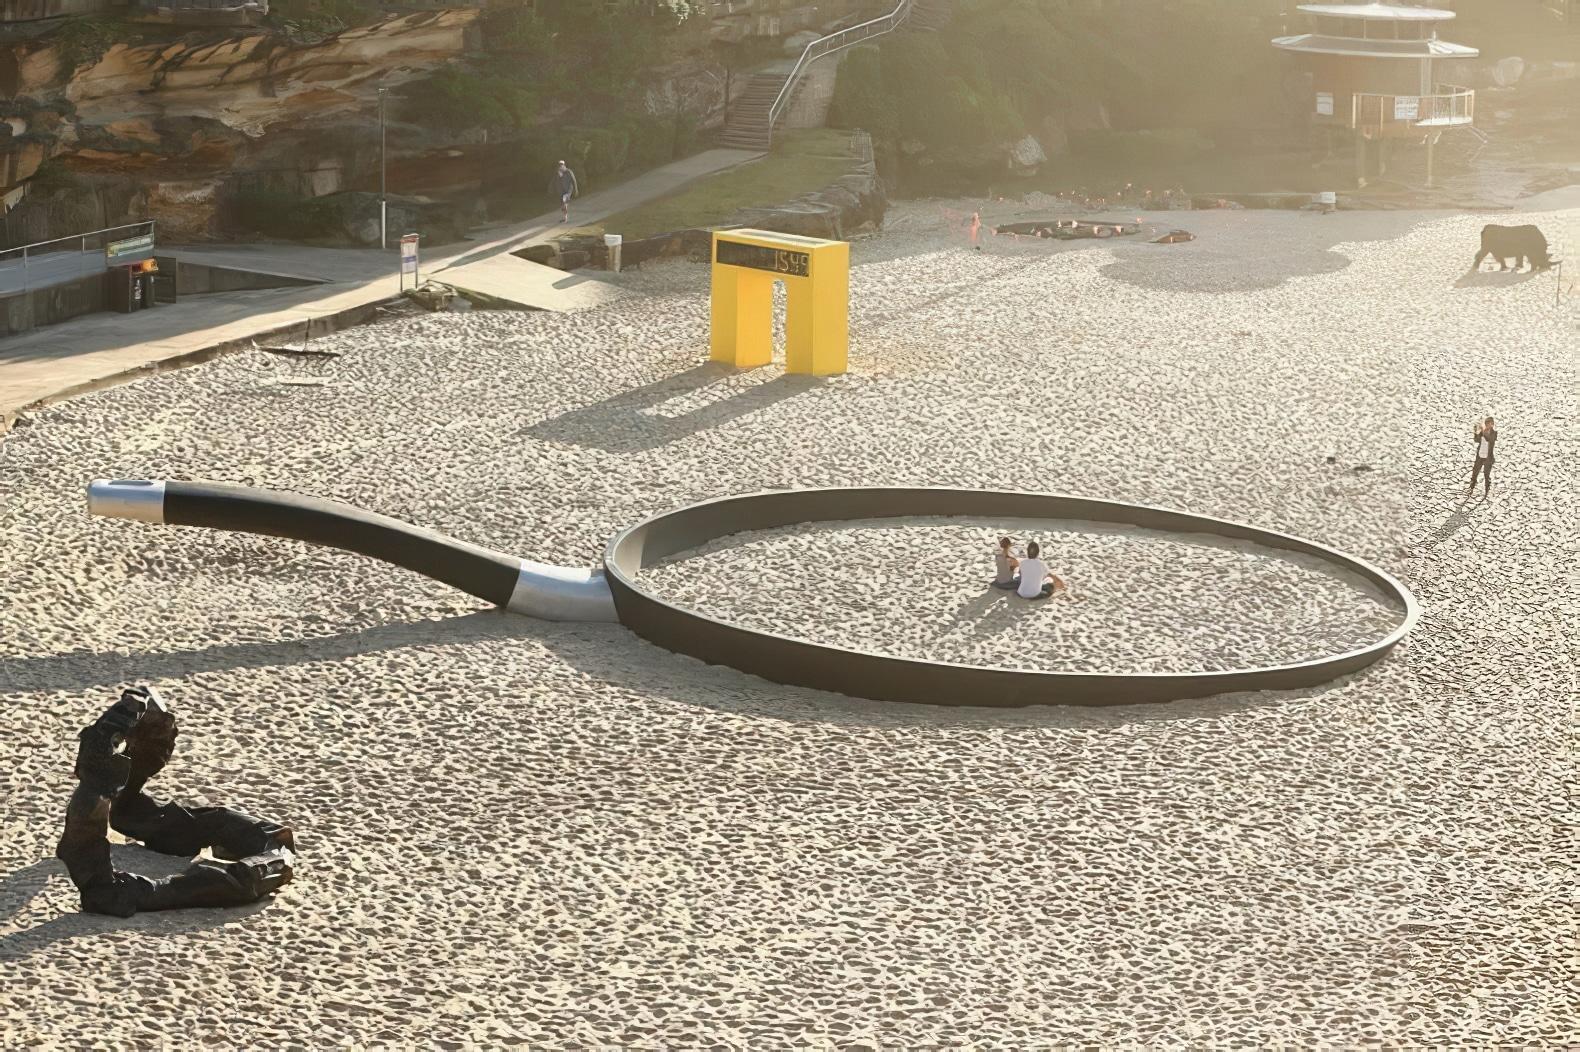 Sculpture by the Sea: une exposition en plein air à Bondi Beach